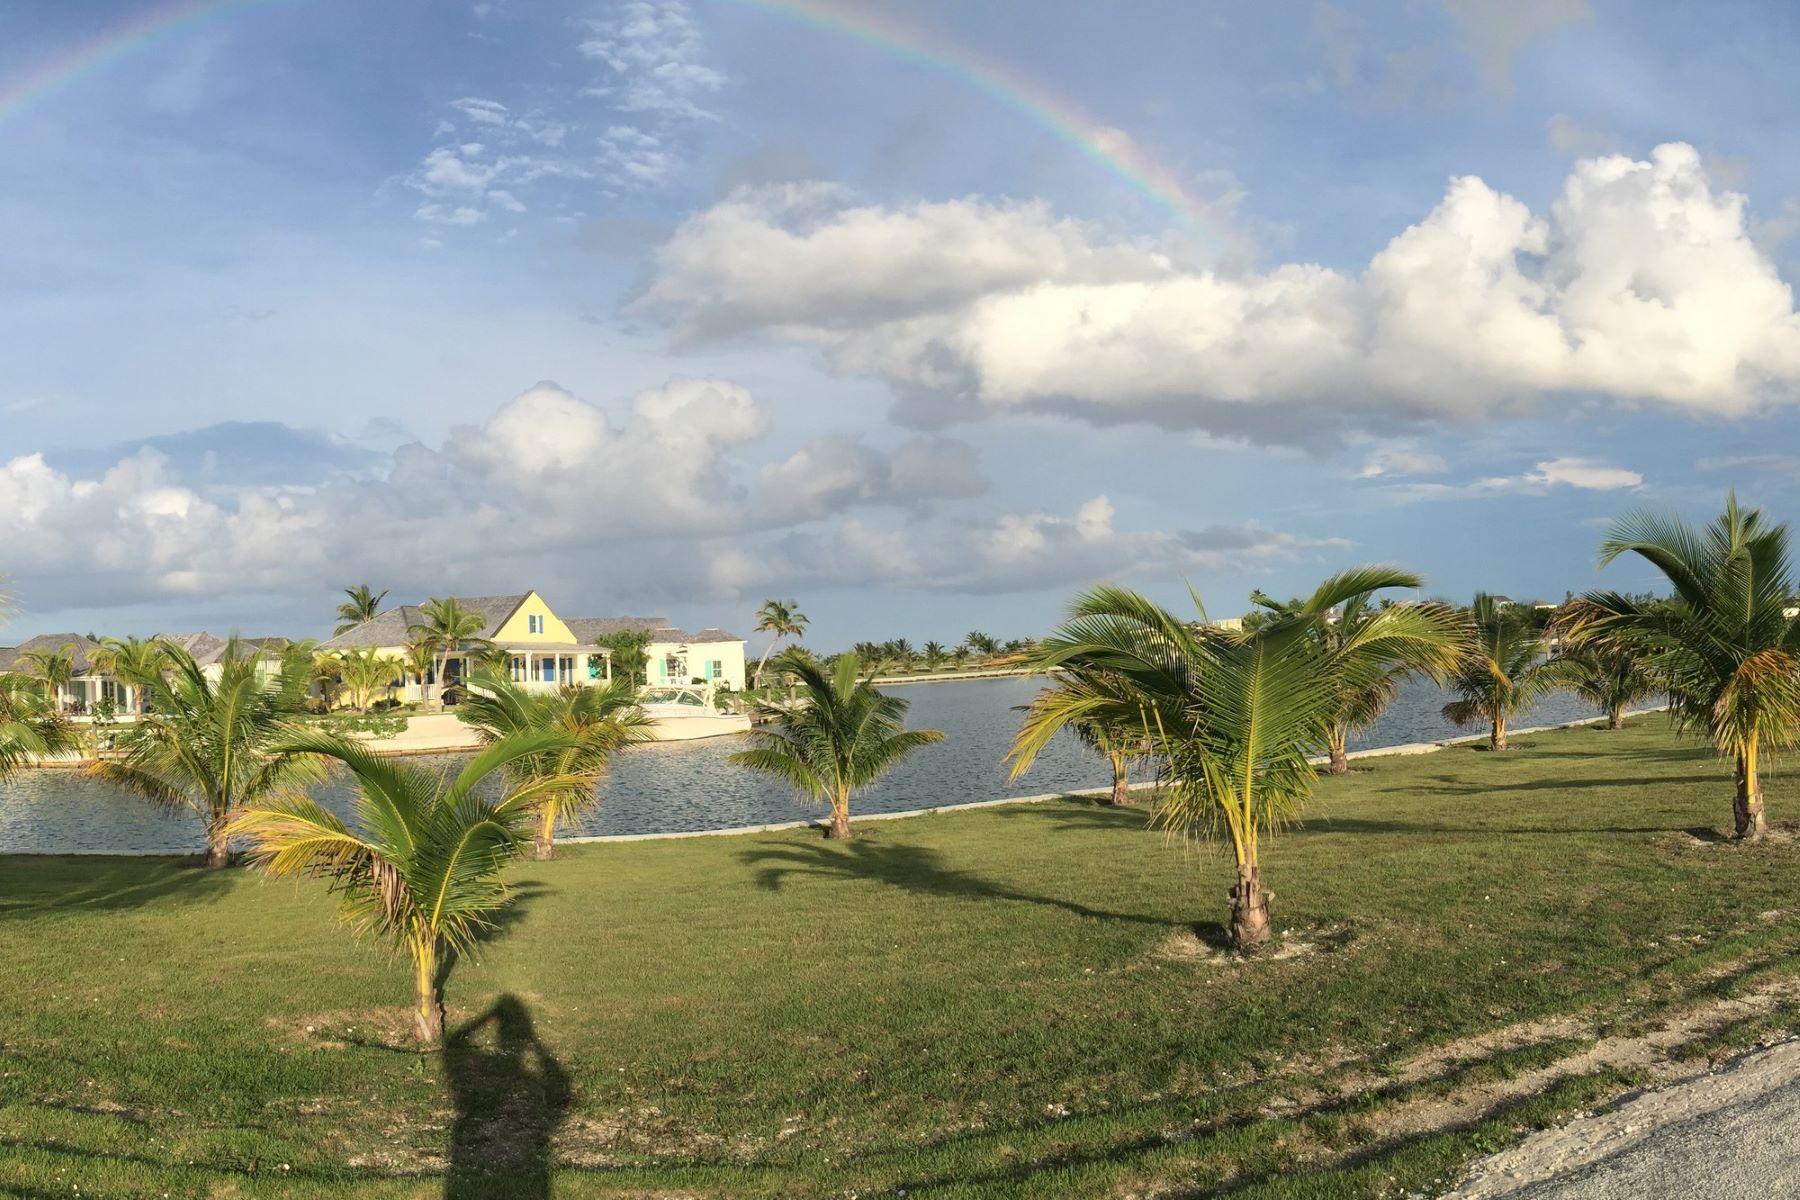 Land for Sale at Bay Street Live Work Lot N-15 Schooner Bay, Abaco Bahamas